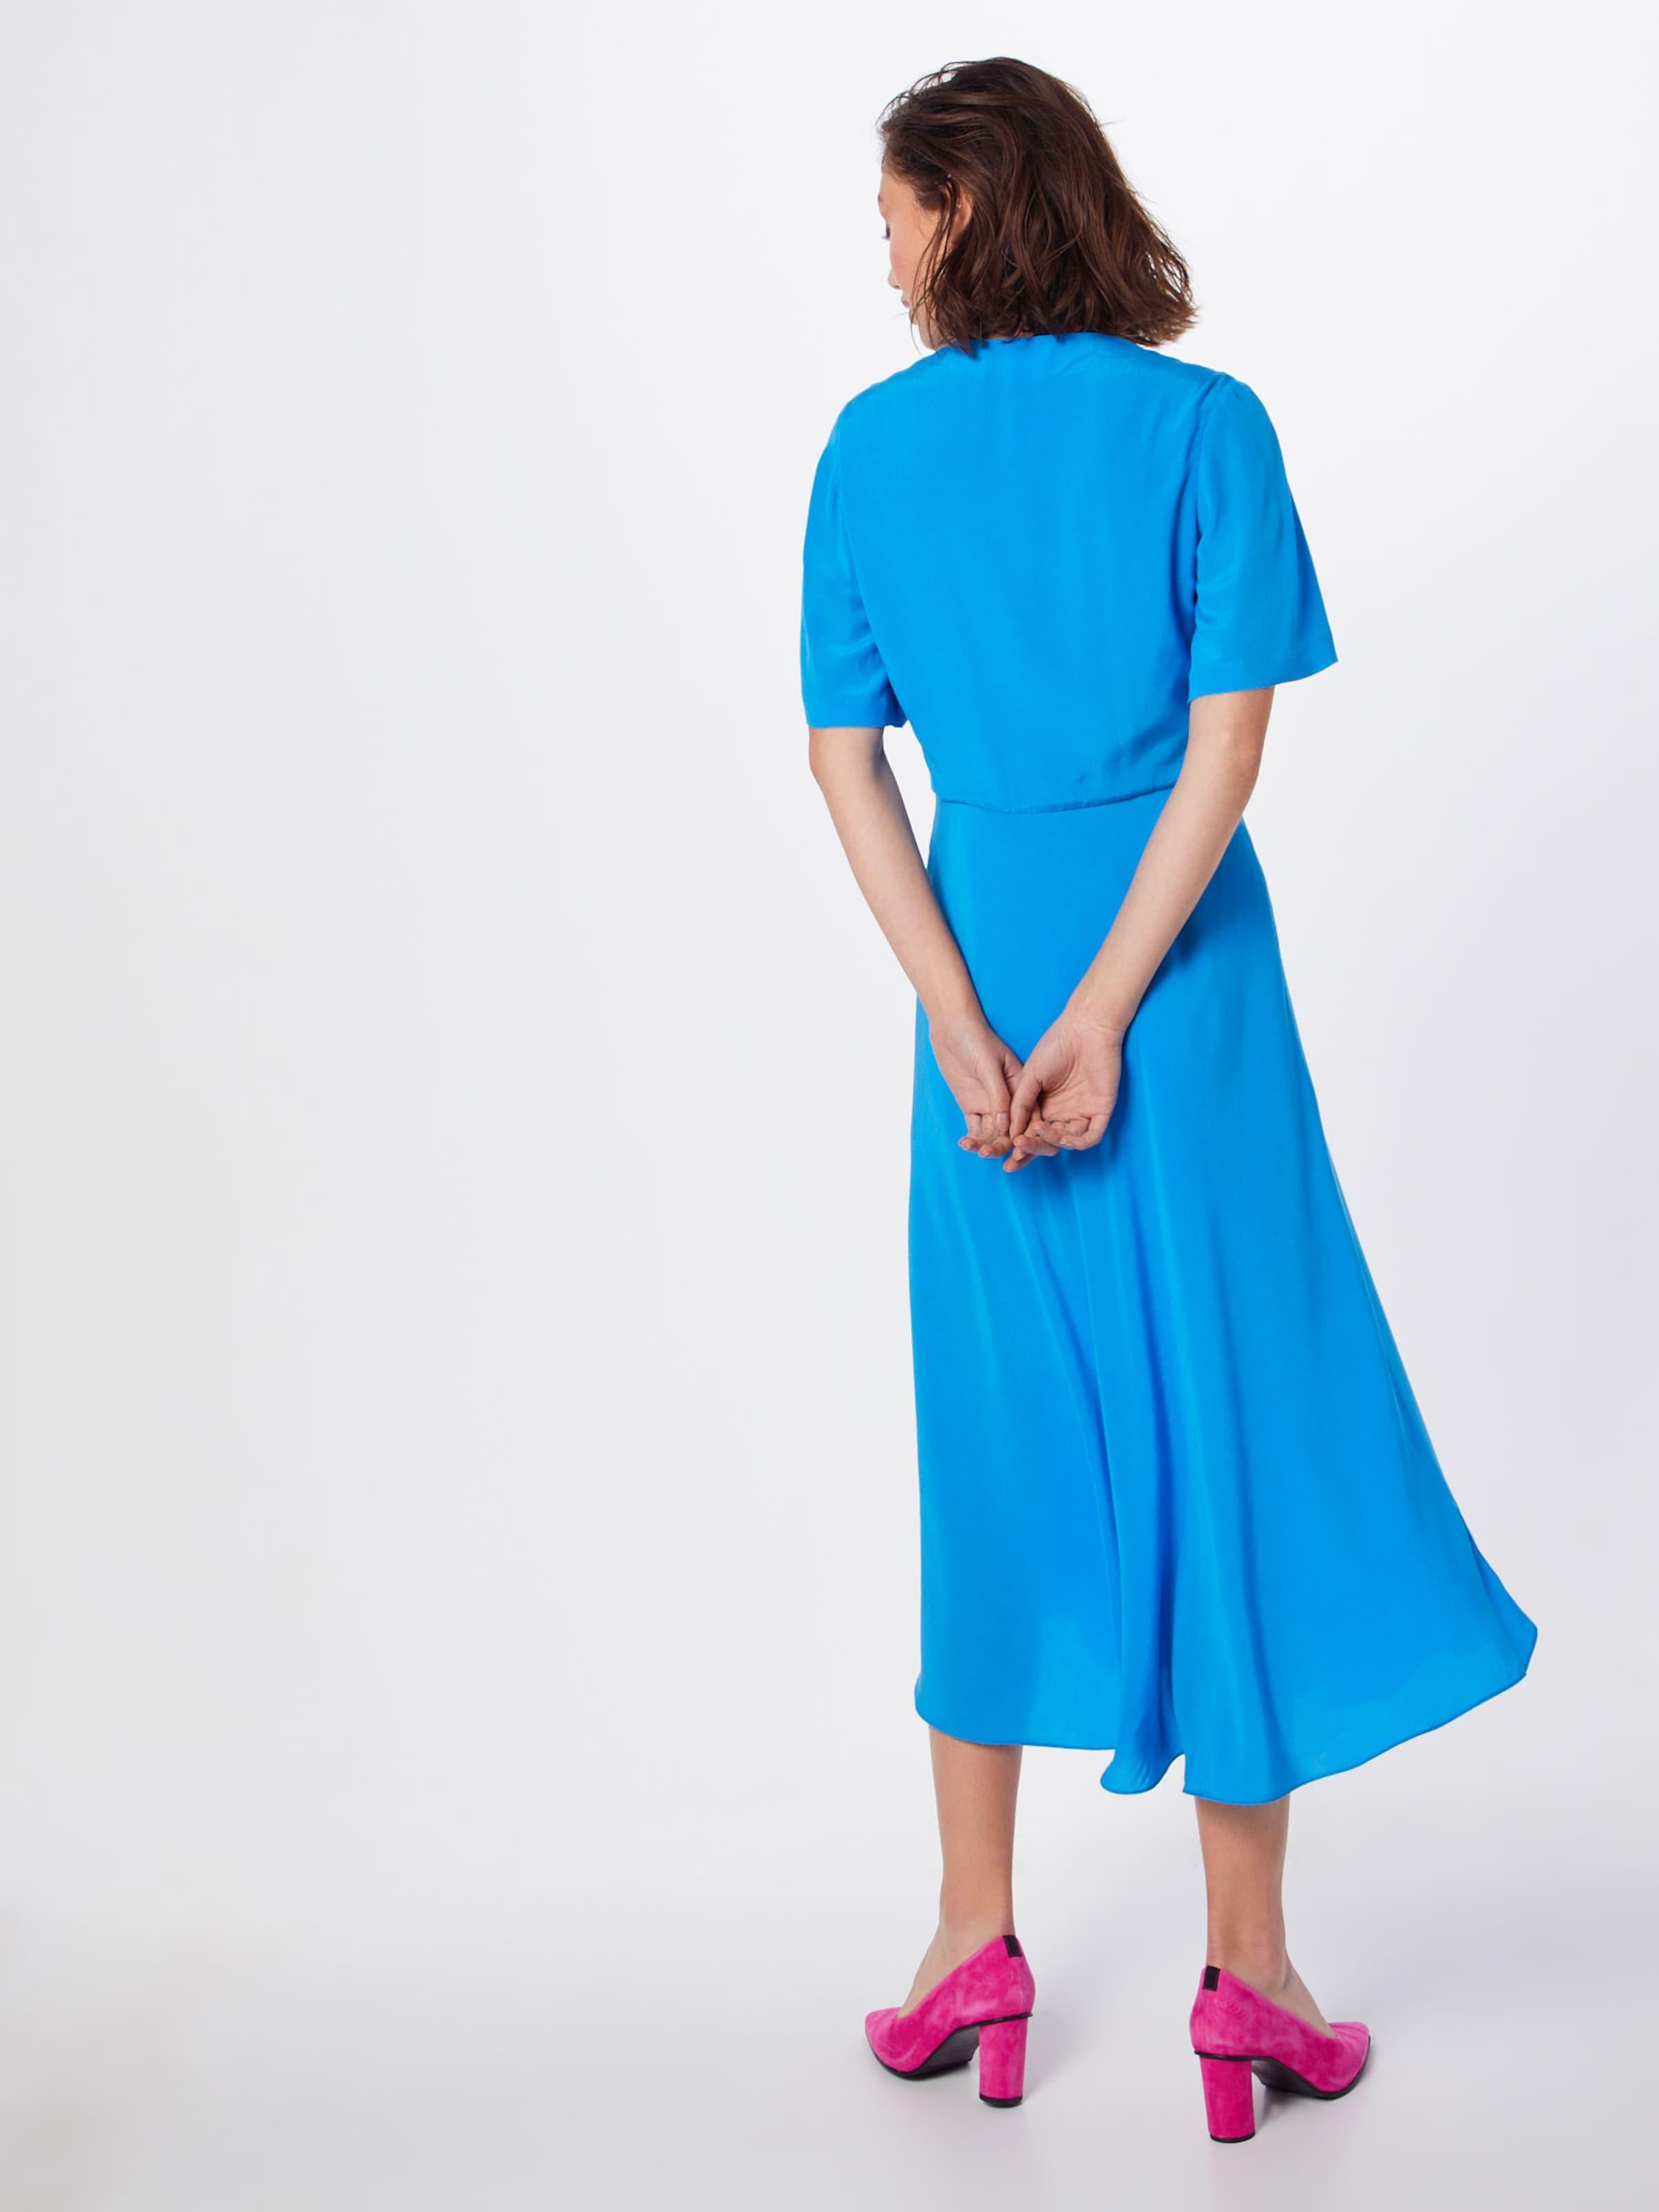 Kleider 'cindy In Blau 10056' Dress Samsoeamp; CrxedoB